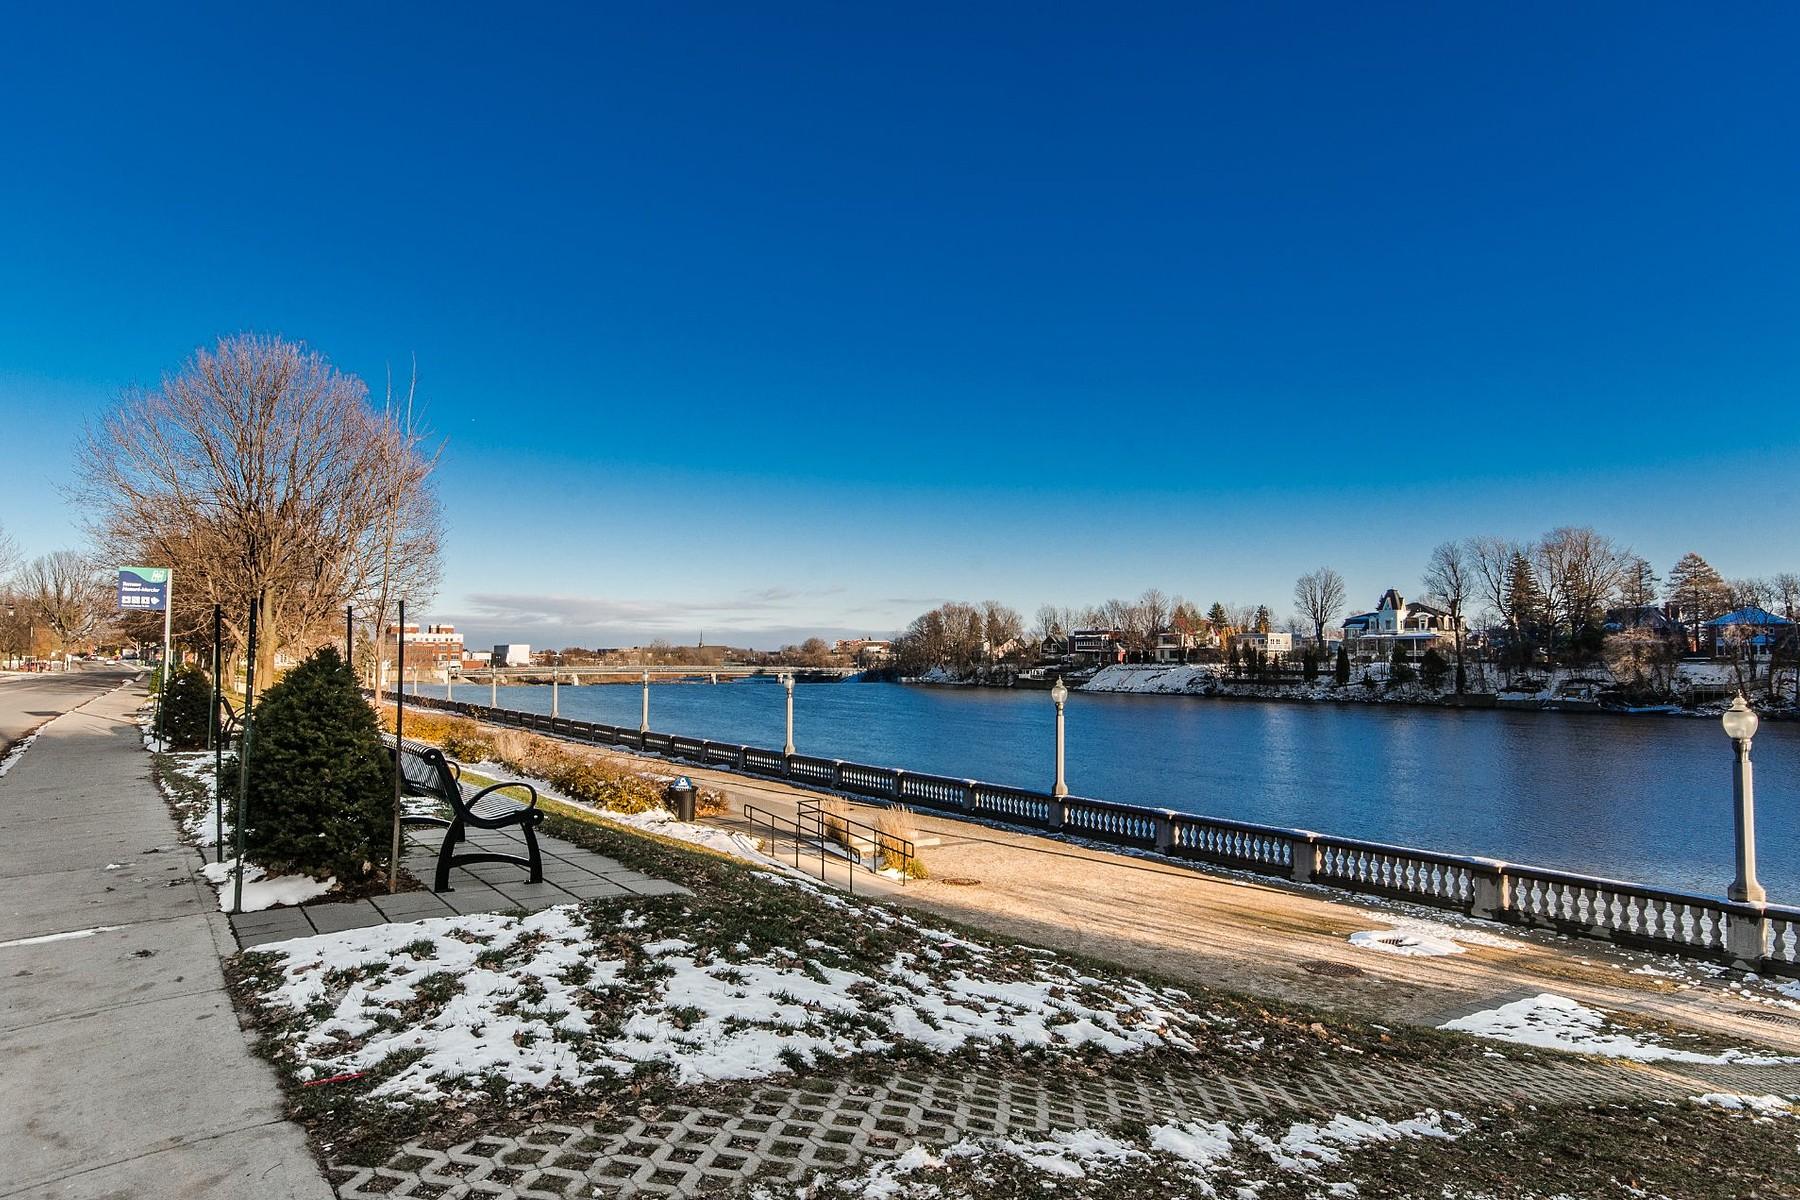 Additional photo for property listing at Saint-Hyacinthe, Montérégie 2610 Rue Girouard O. Saint-Hyacinthe, Quebec J2S2B4 Canada